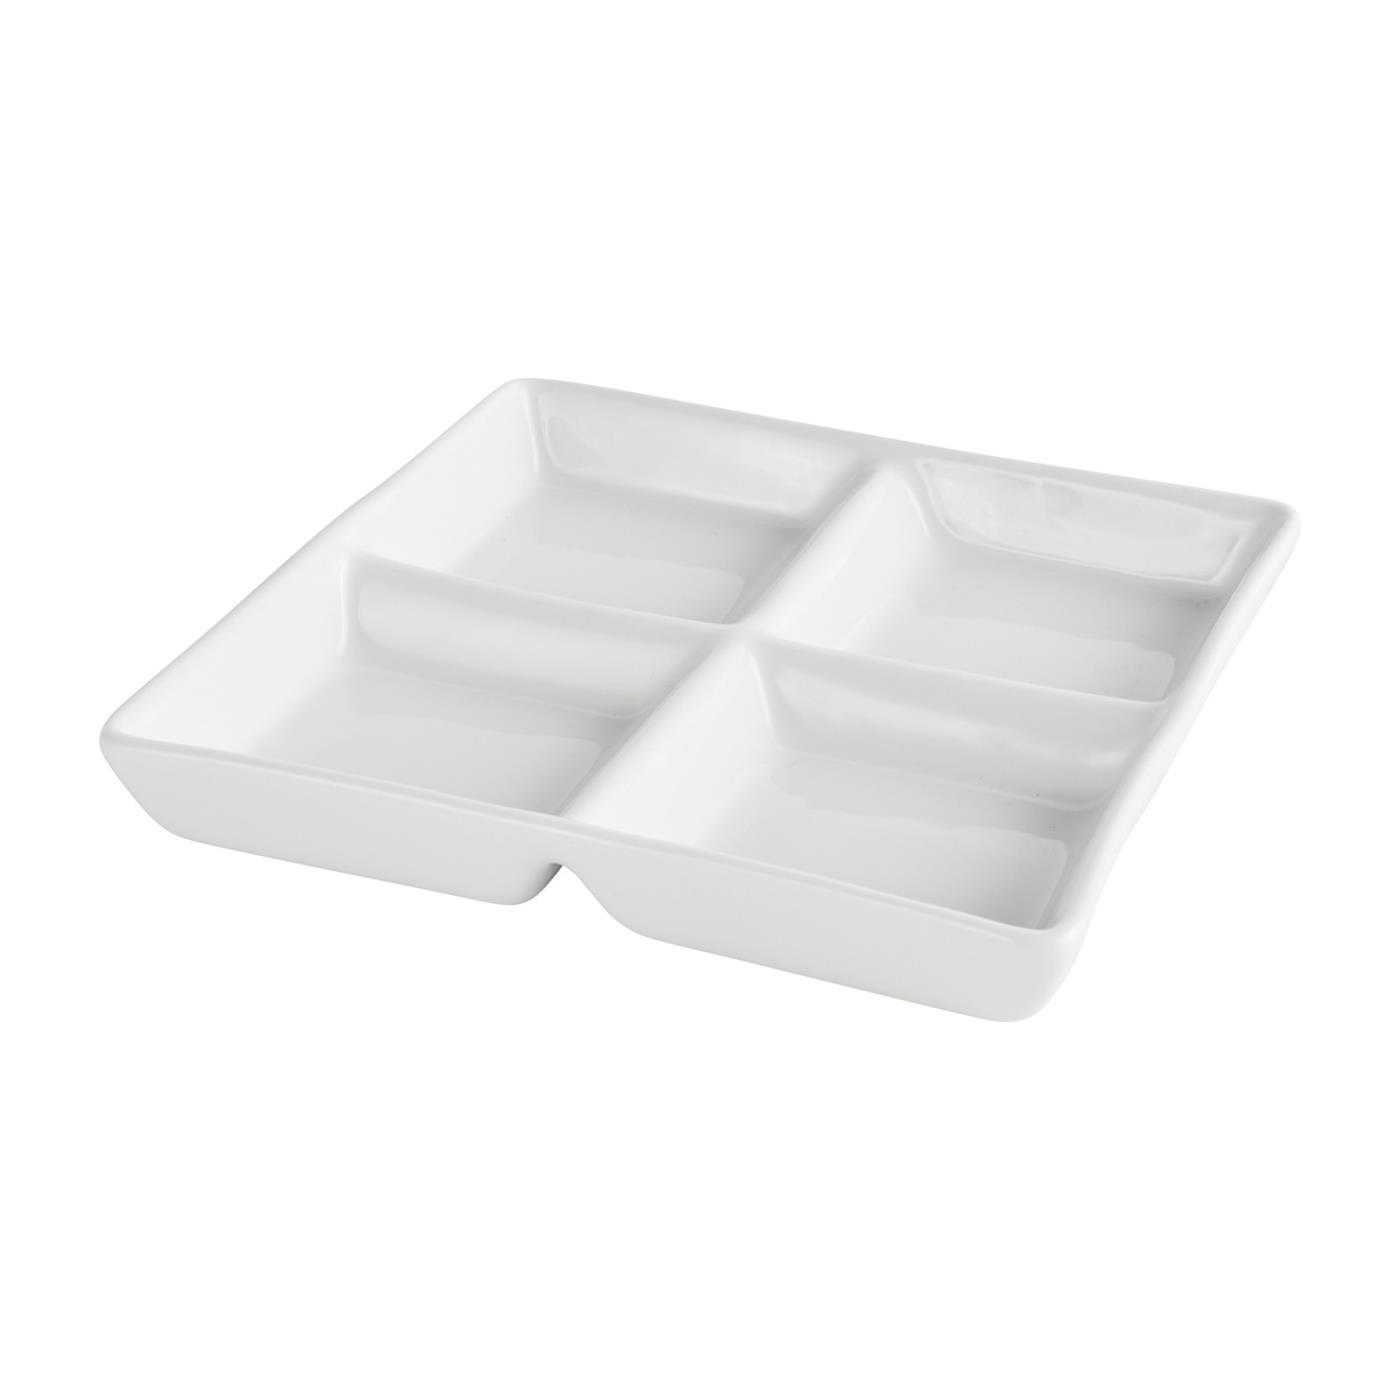 "Ceramic Square 4 Compartment Tasting Dish - 10"" With 4 Compartments"